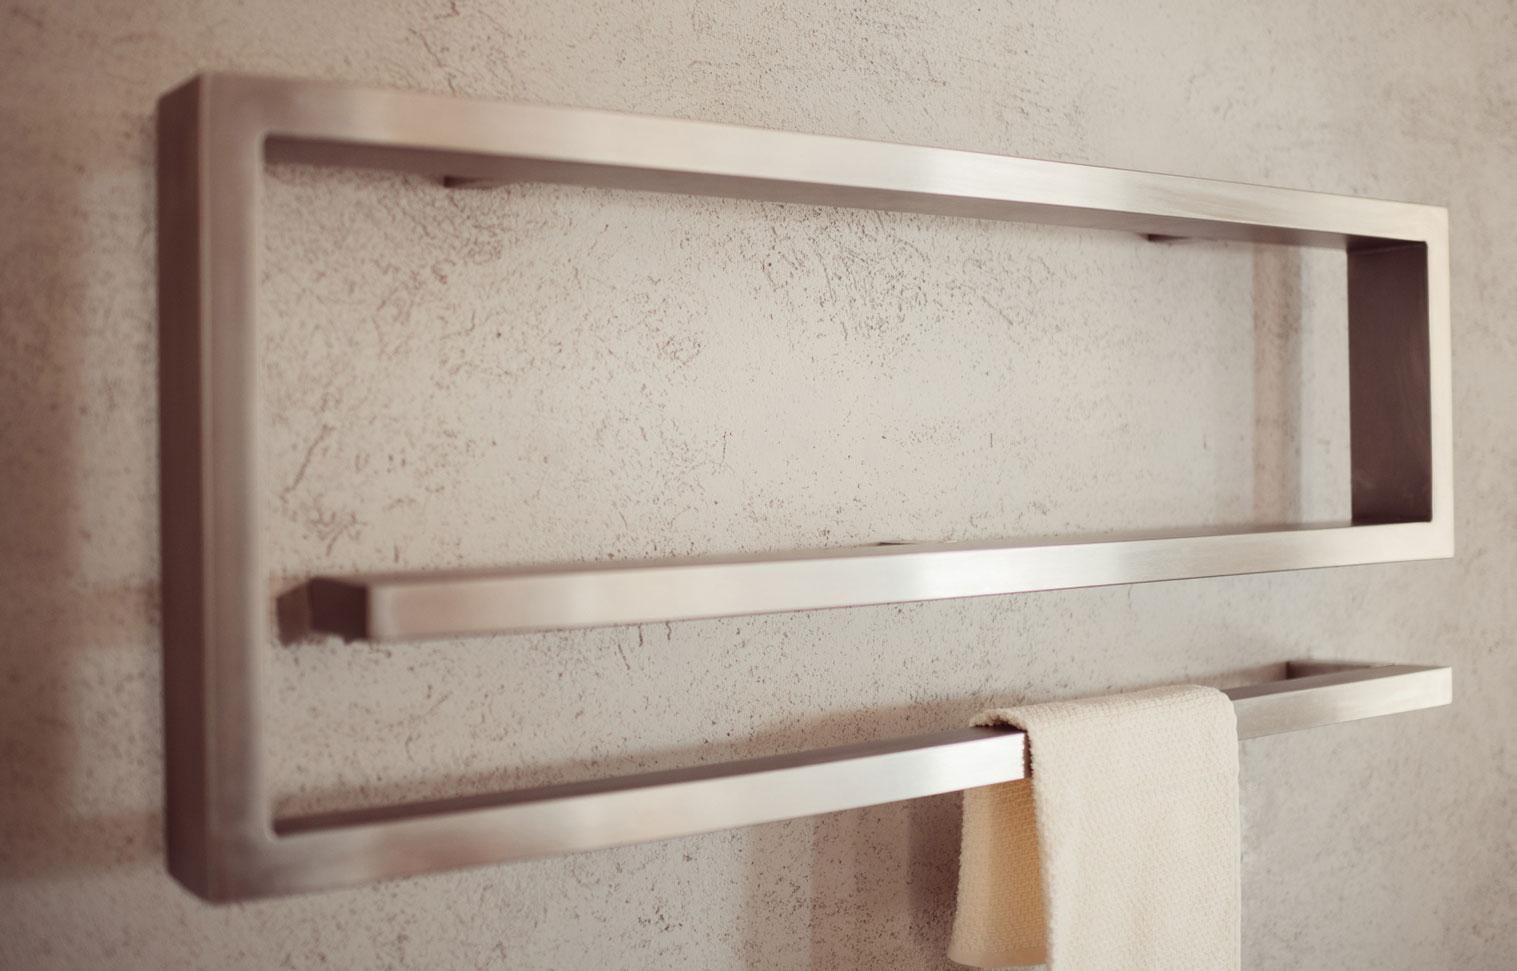 SÈCHE-serviette en acier inoxydable eos-graziano